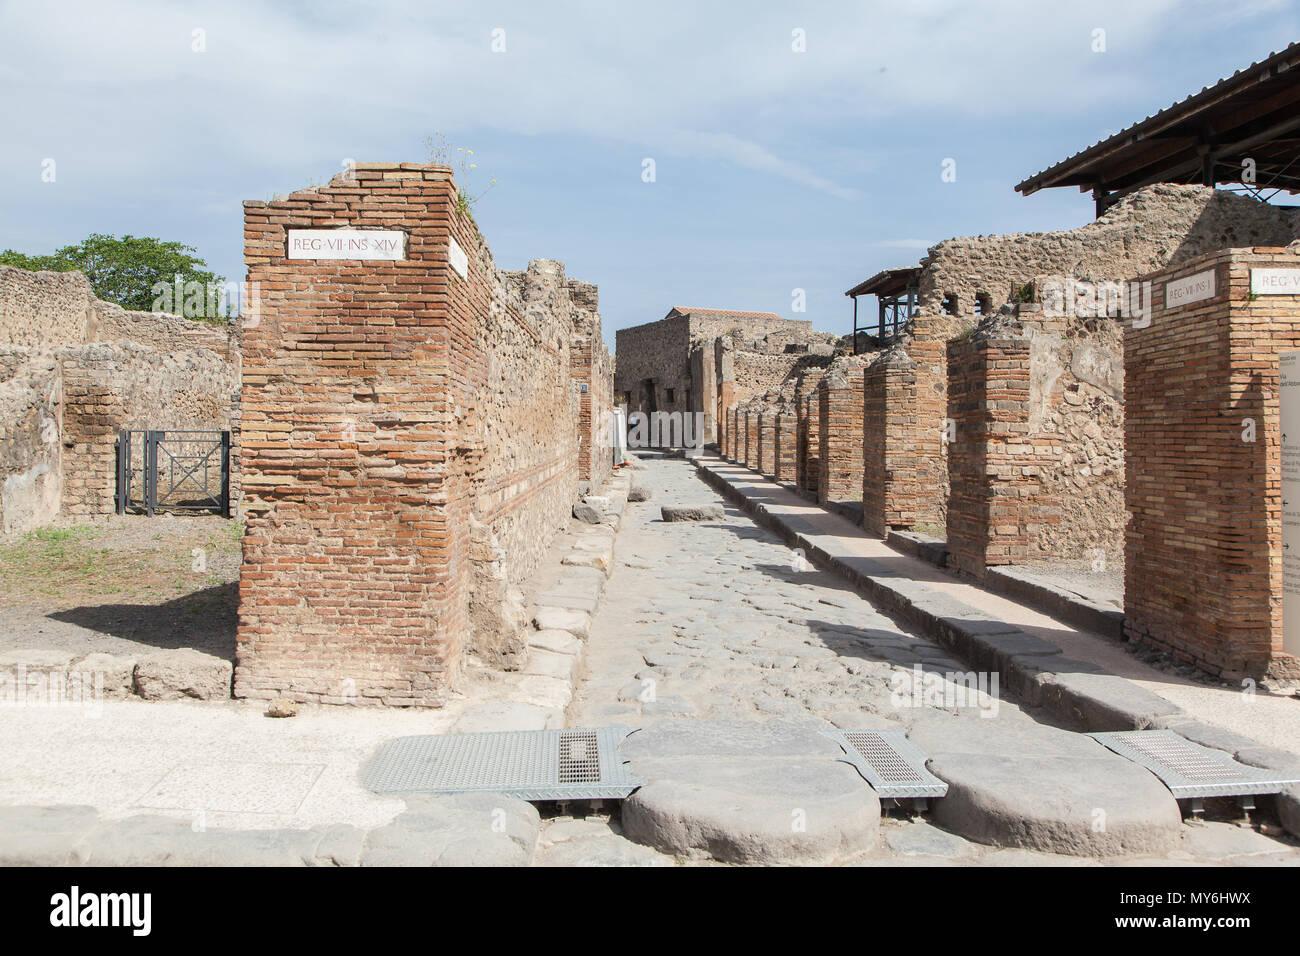 Ausgrabungsstätte Pompeji Neapel Vesuv - Stock Image